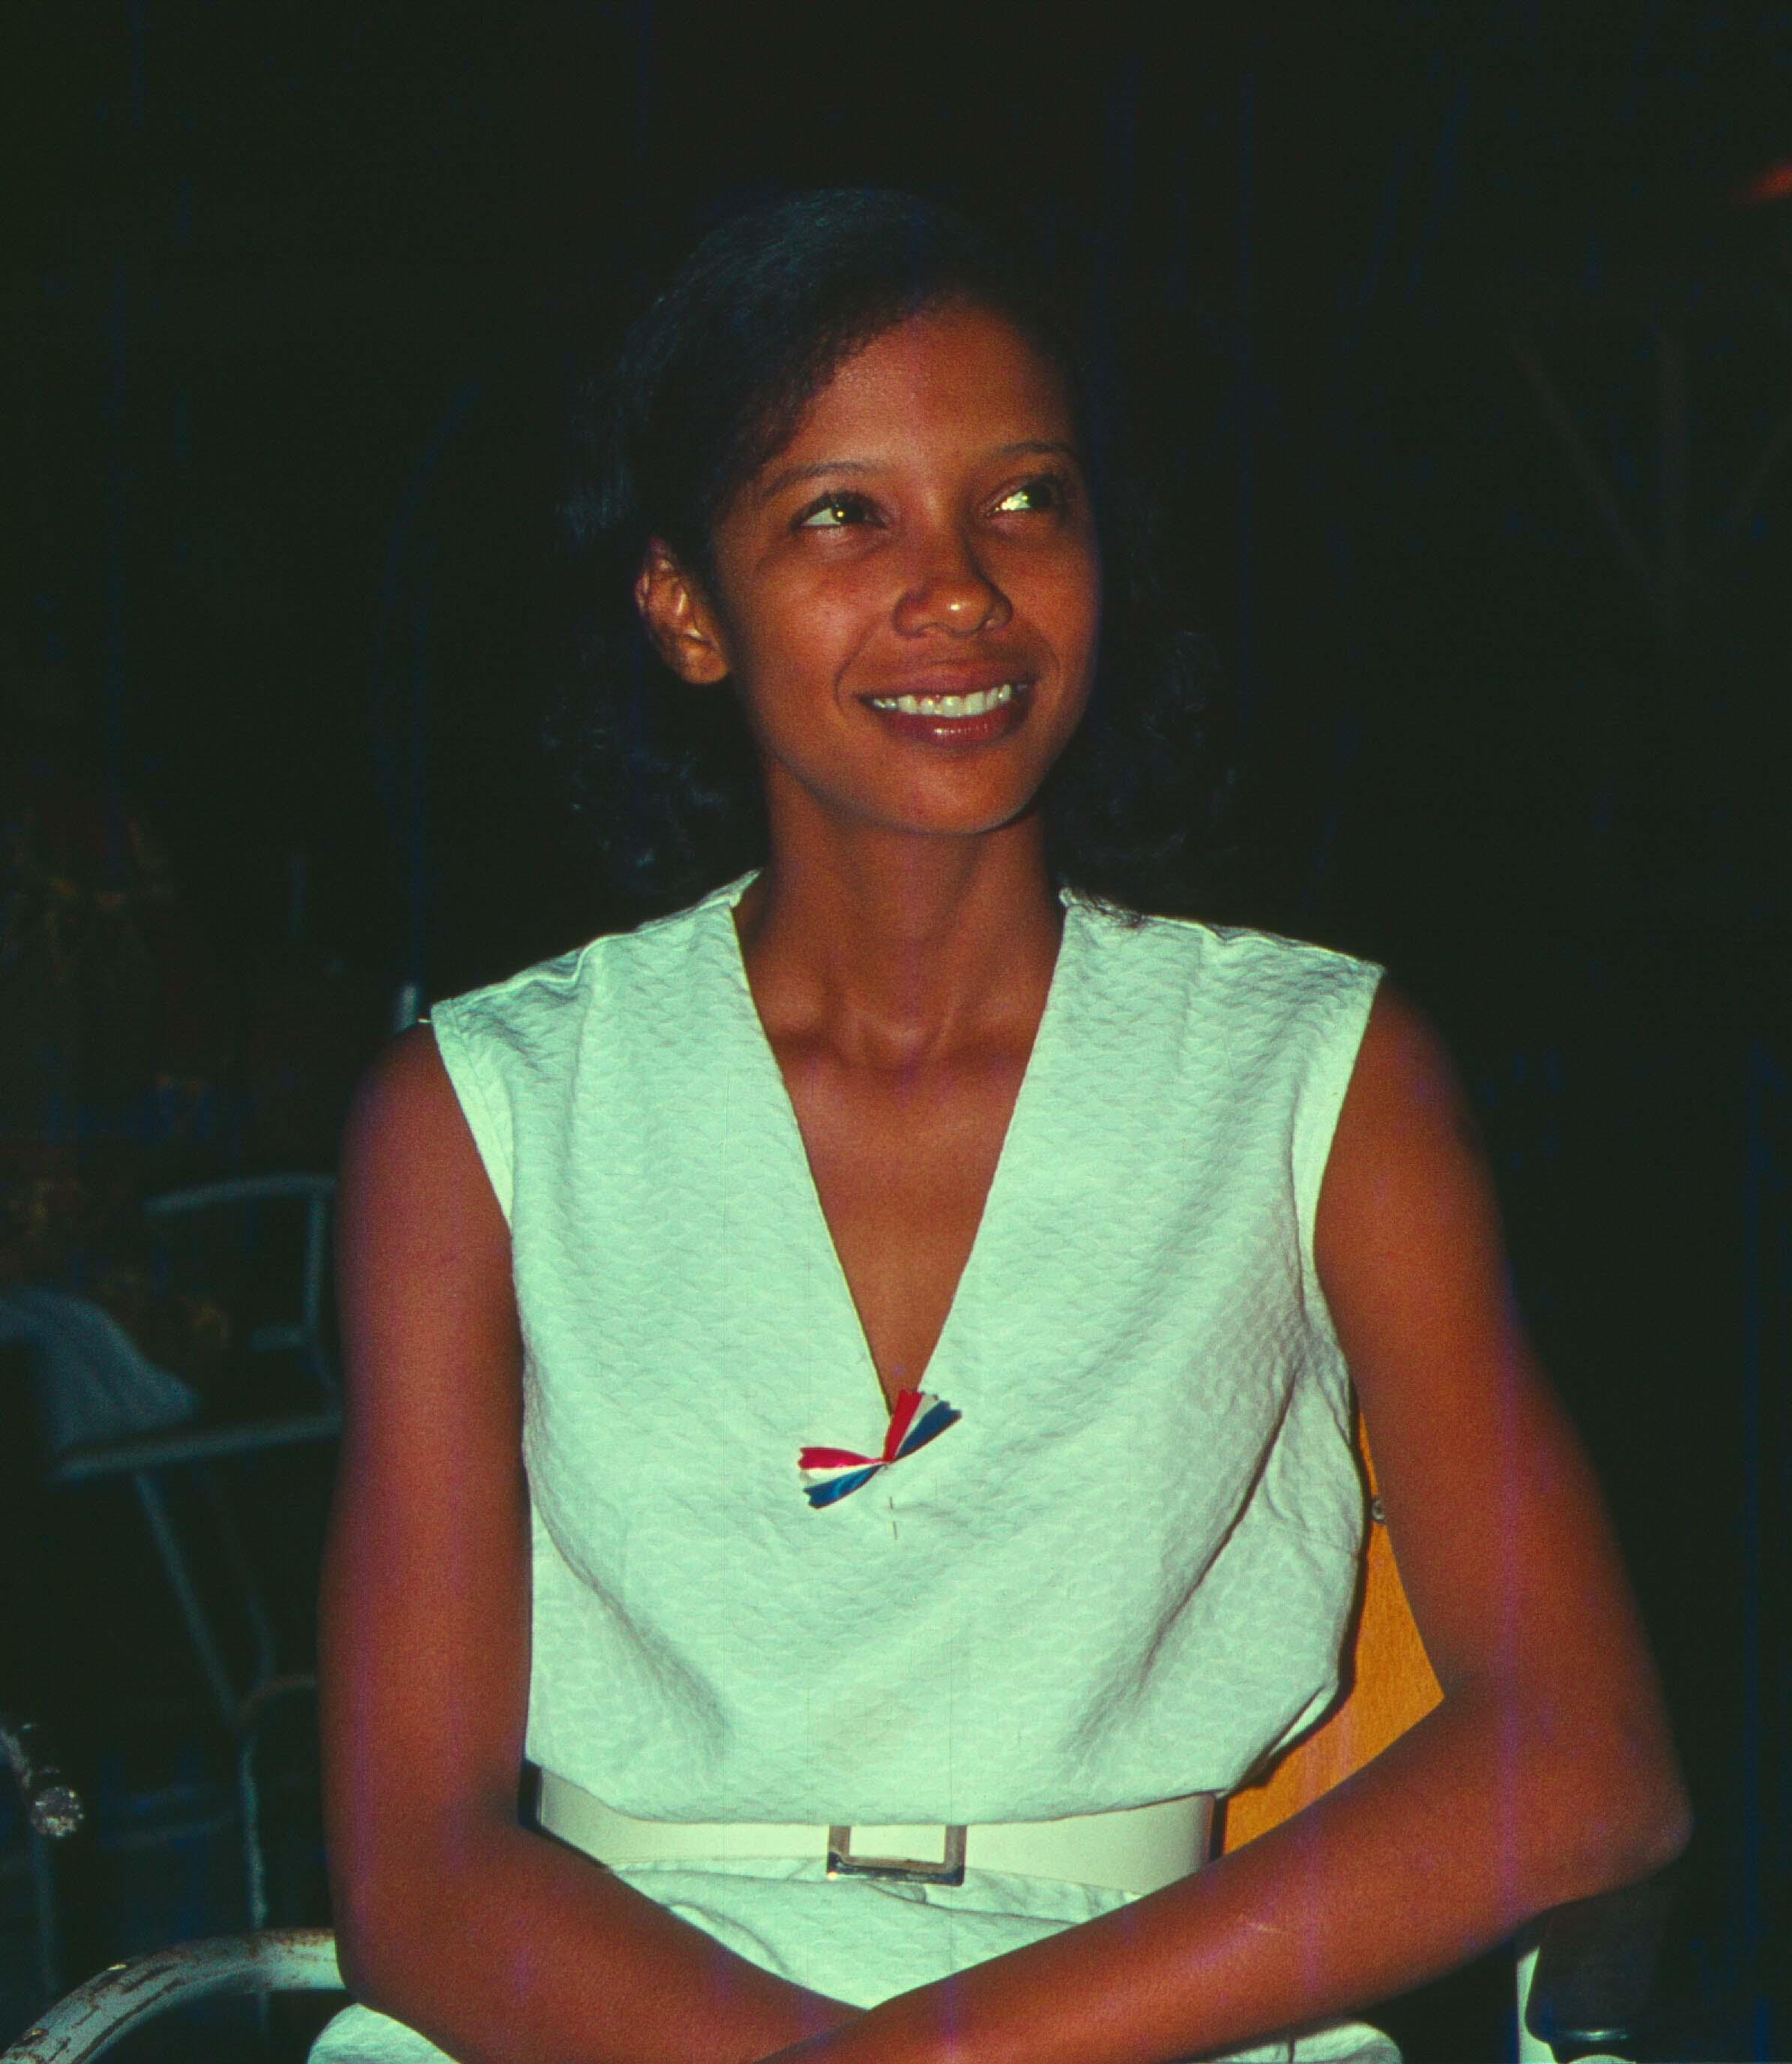 317. Suriname